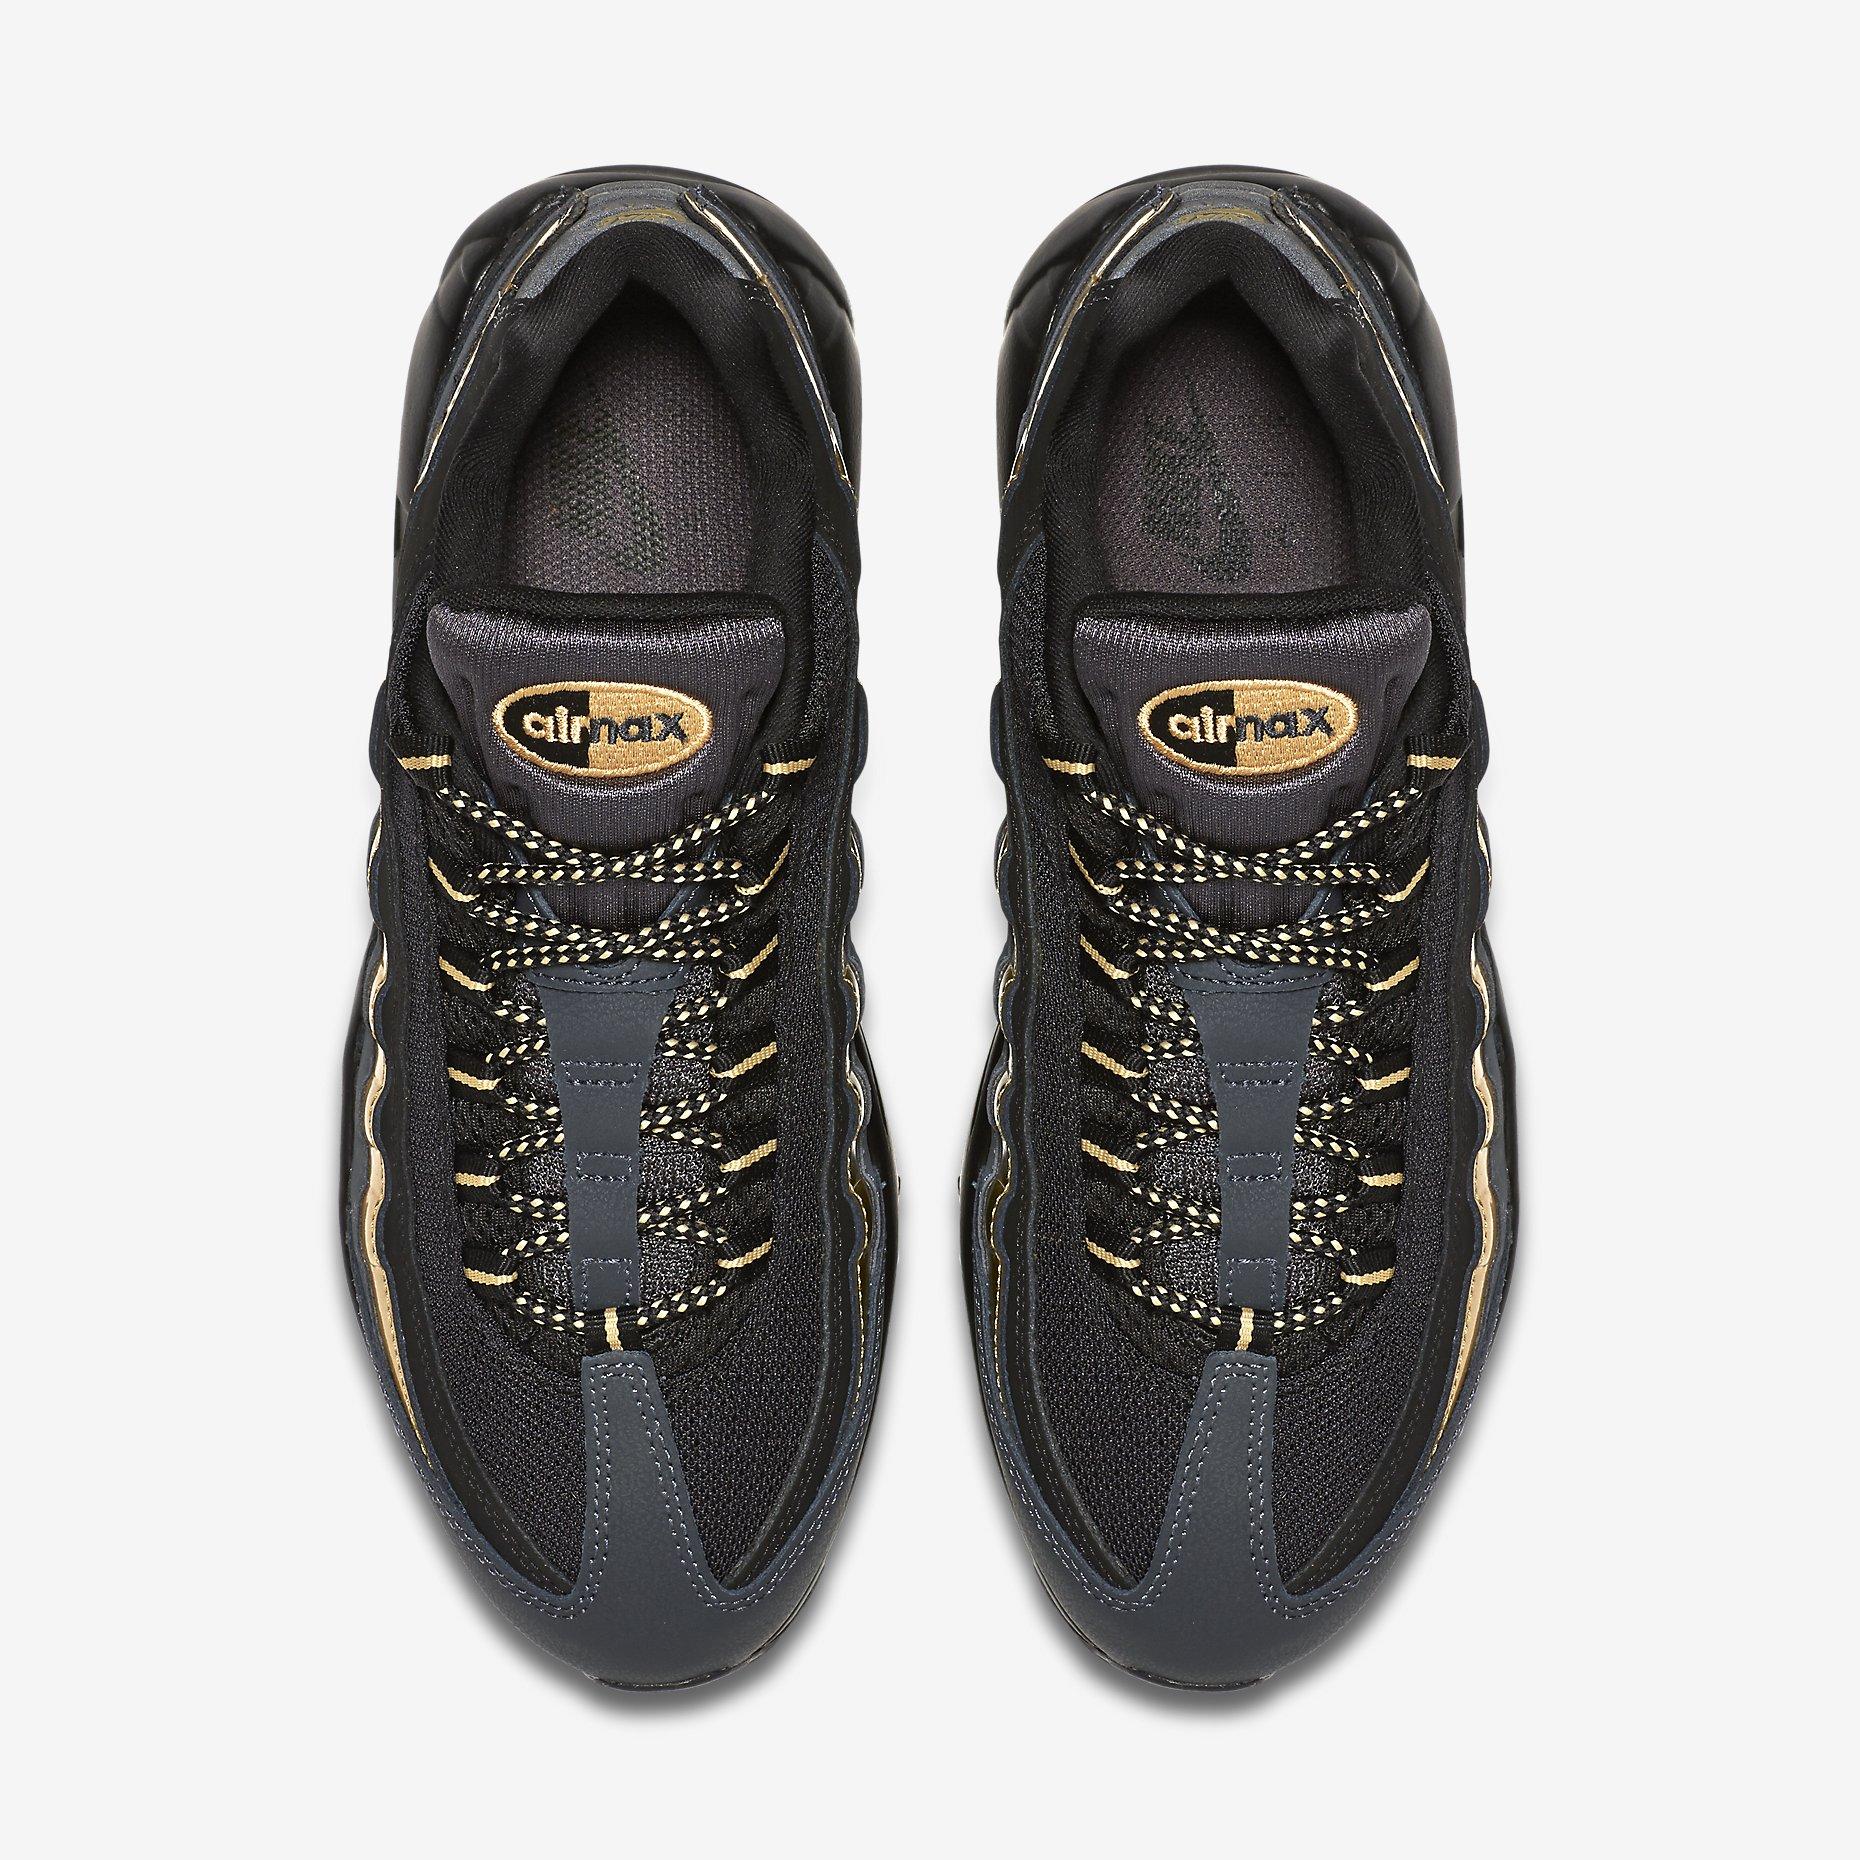 sale retailer 6cdc5 02dcd Nike Air Max 95 Premium Bronze